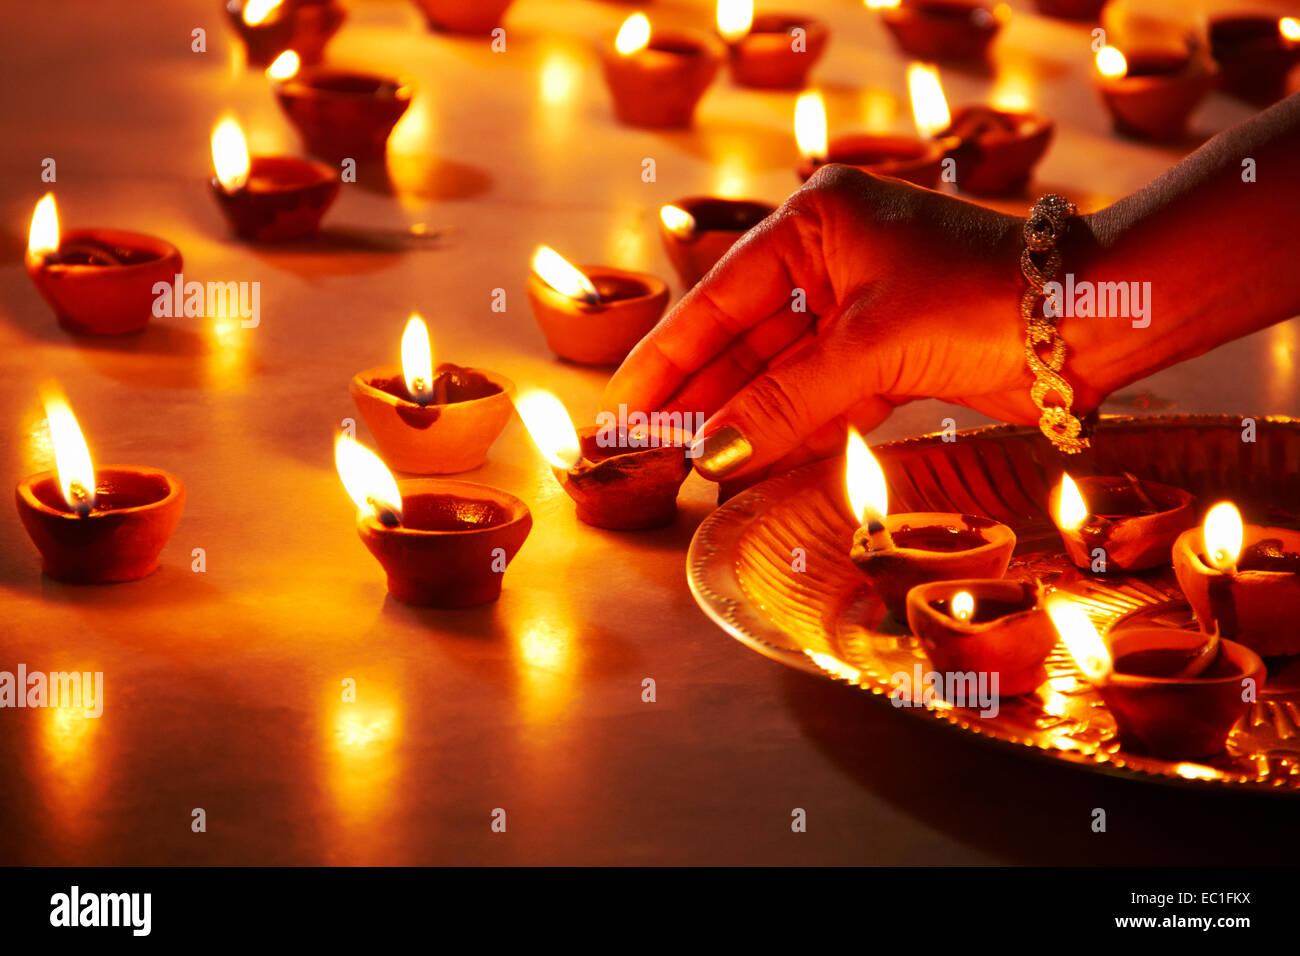 1 indian lady festival diwali home arranging diya worship stock